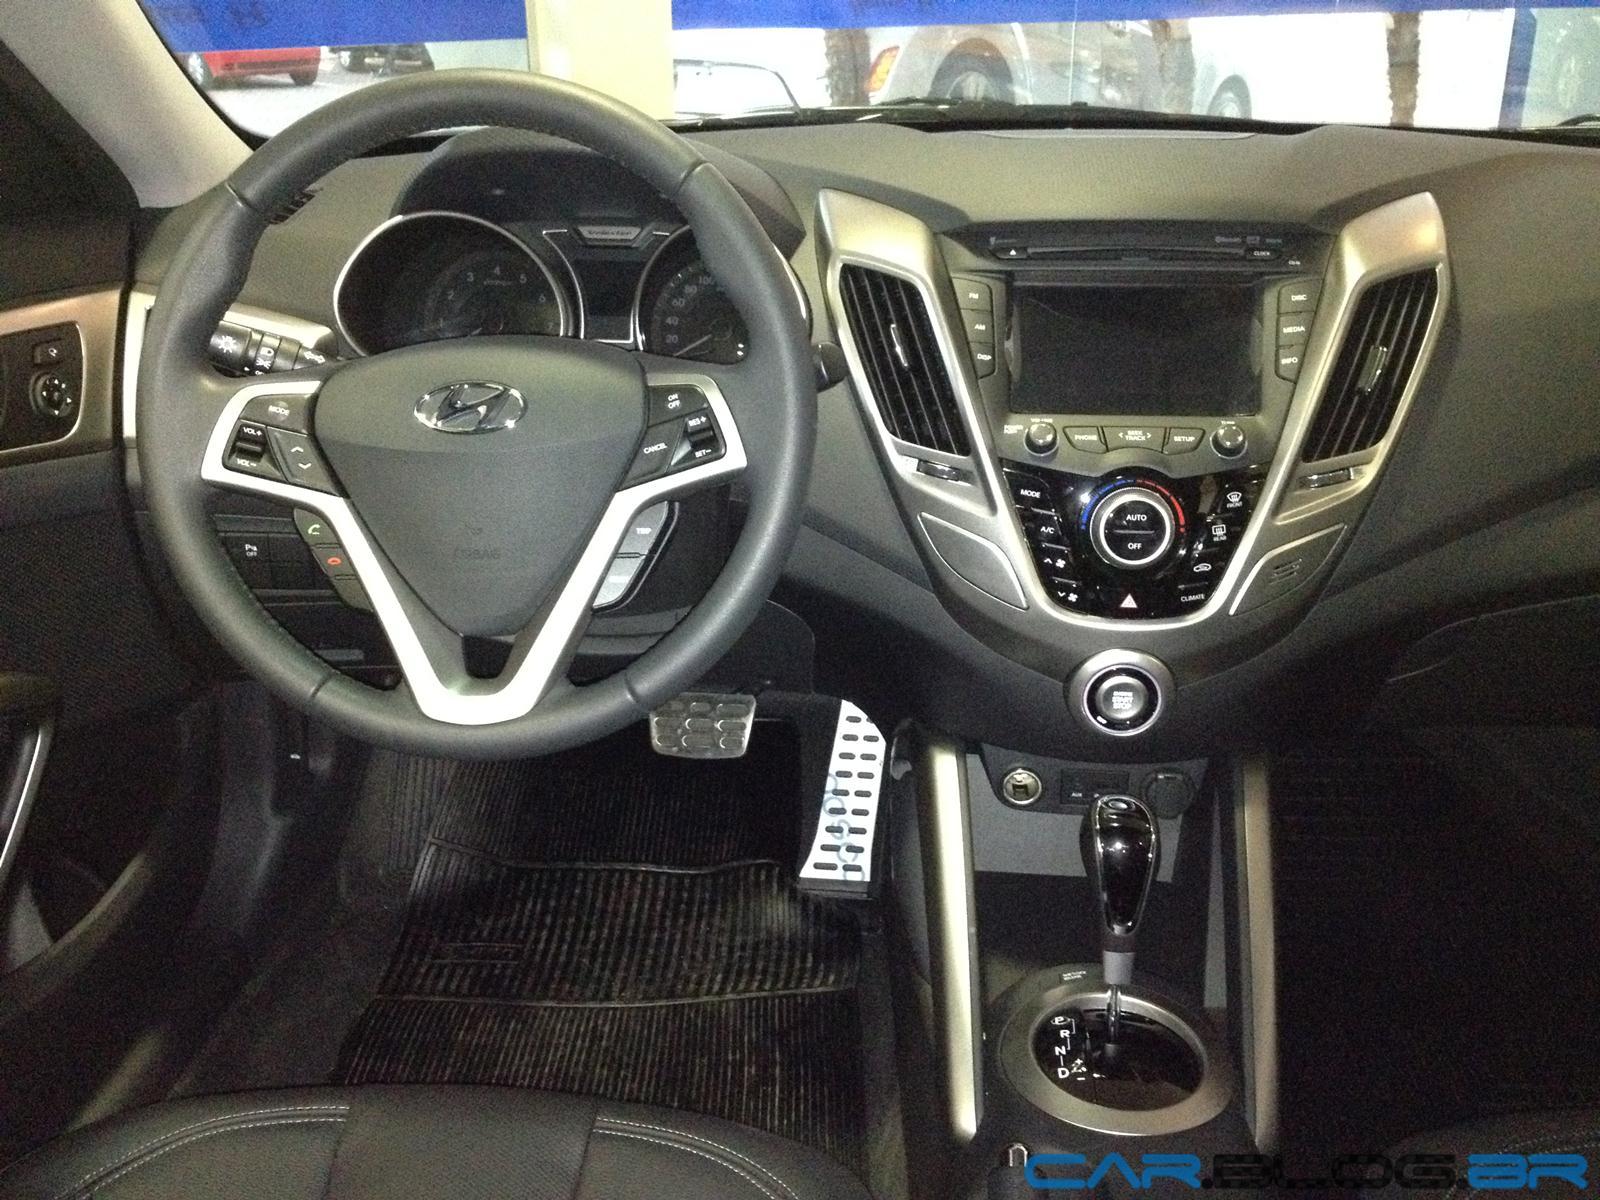 Hyundai Veloster 2013 Fotos Pre 231 O Consumo E Ficha